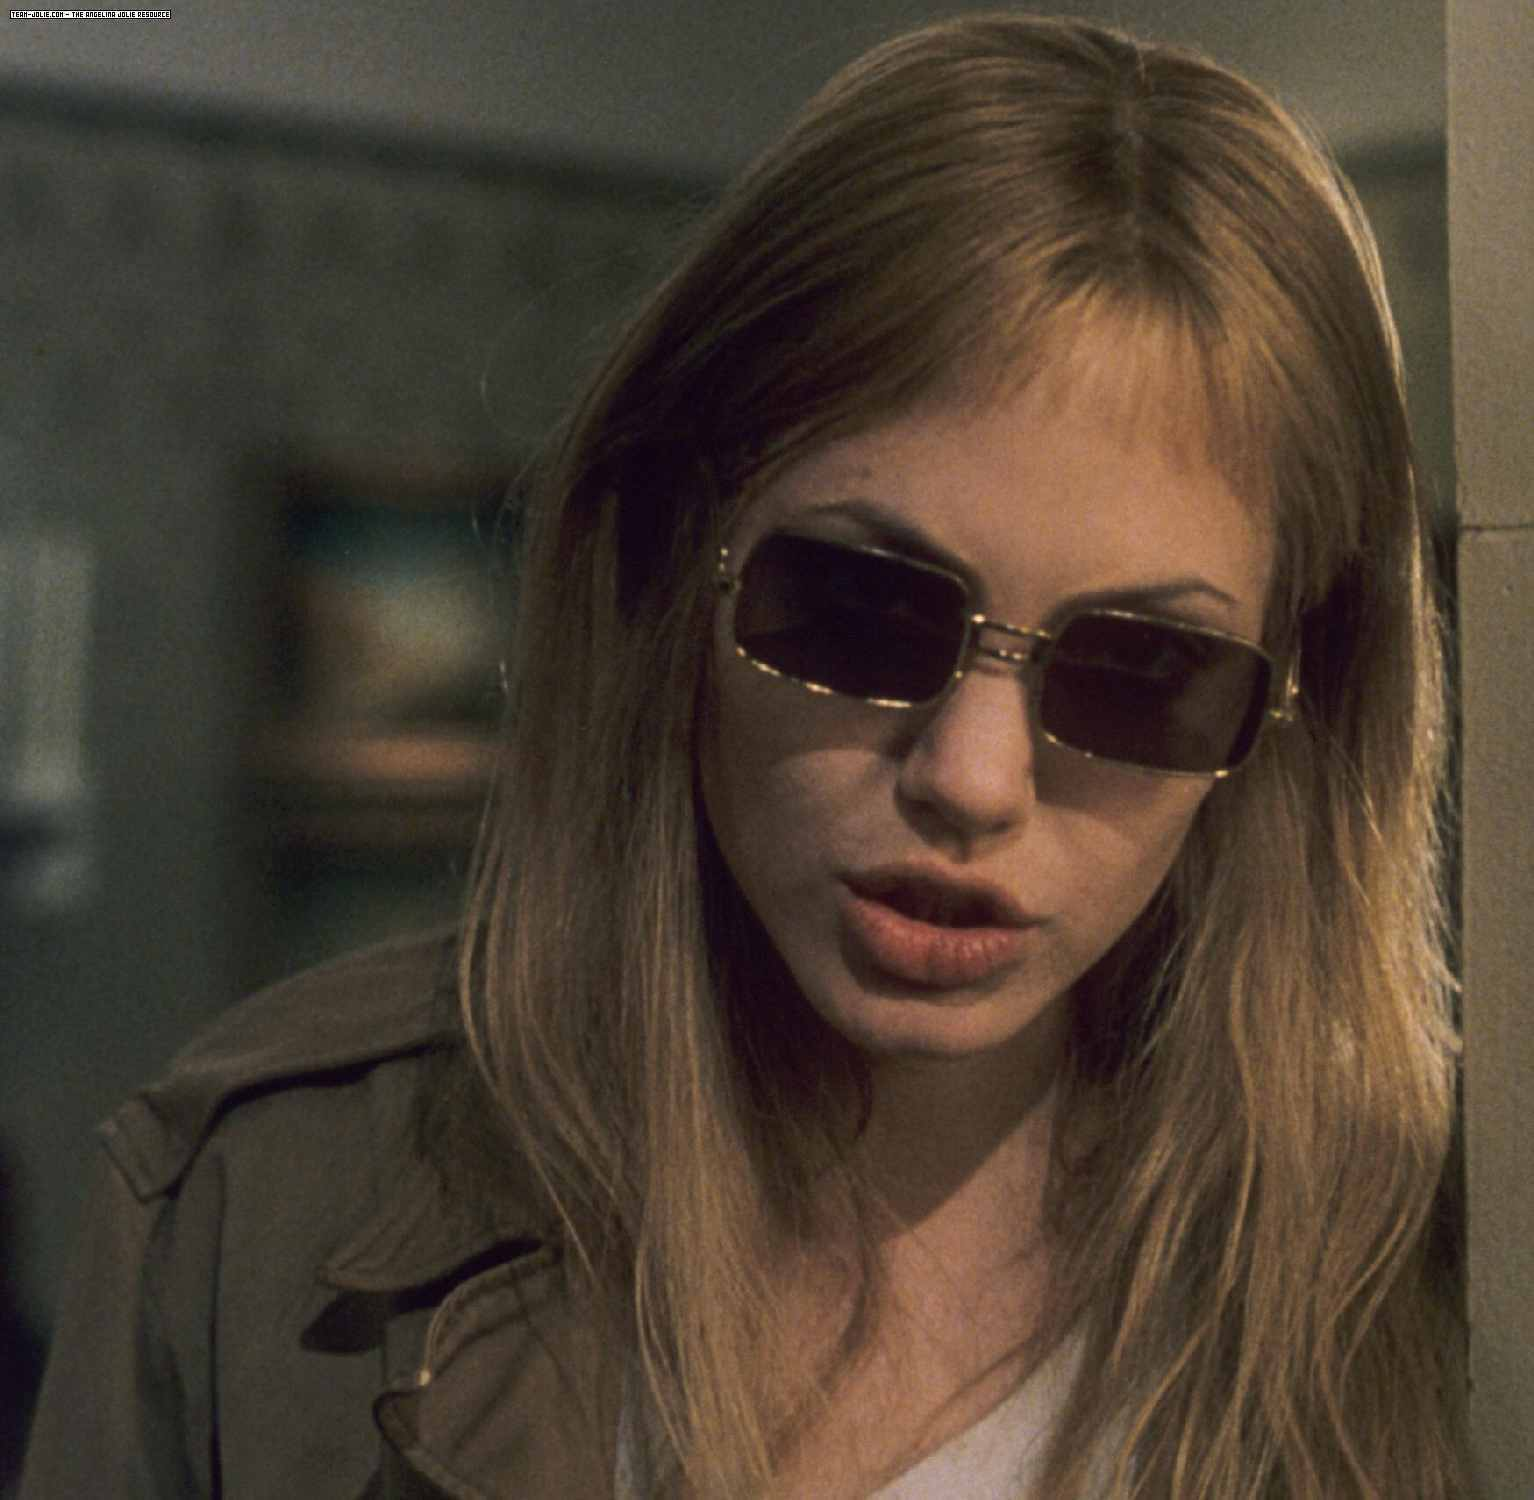 http://1.bp.blogspot.com/-09bI9Fz5yhE/T42KeZlejyI/AAAAAAAABHI/Mz_ZvBFhlCQ/s1600/Girl-Interrupted-Movie-Still-girl-interrupted-16264626-1534-1500.jpg